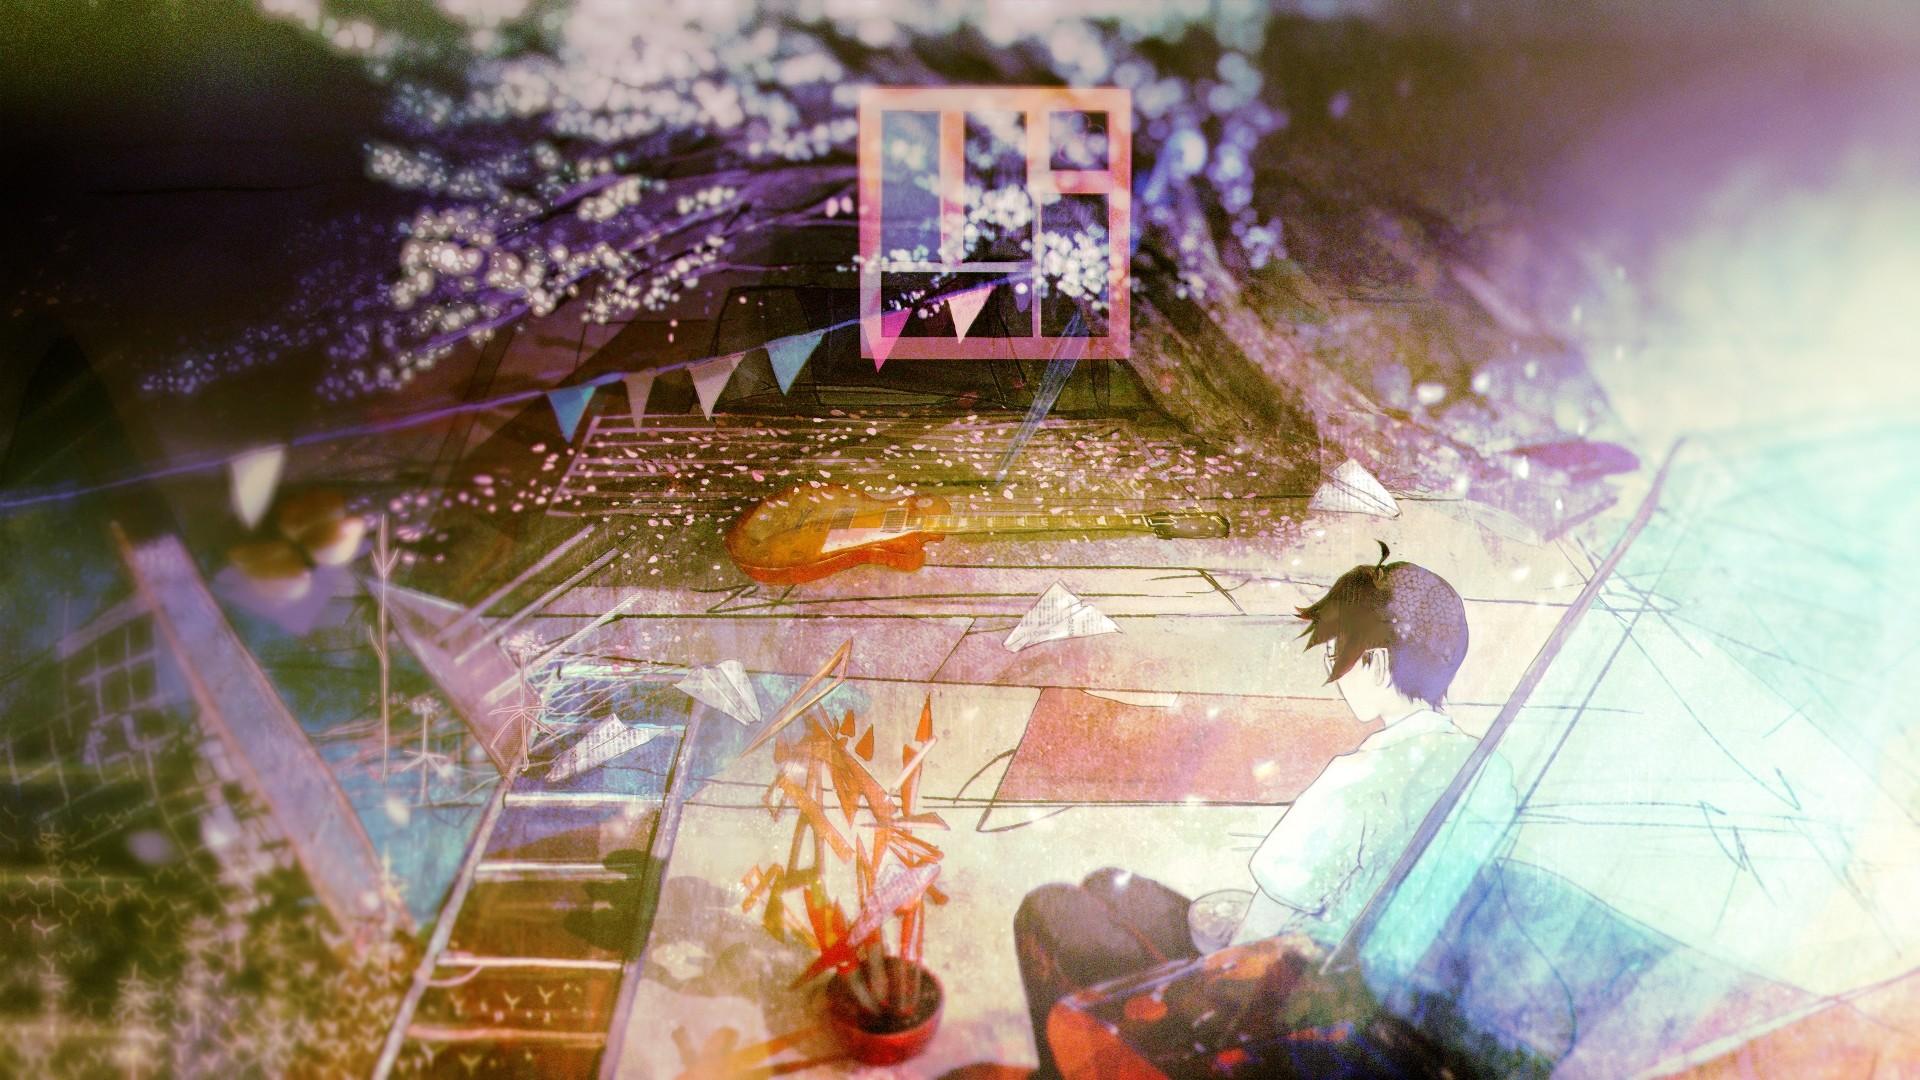 Watashi (Yojouhan Shinwa Taikei) · download Watashi (Yojouhan Shinwa  Taikei) image · Members only. The Tatami Galaxy